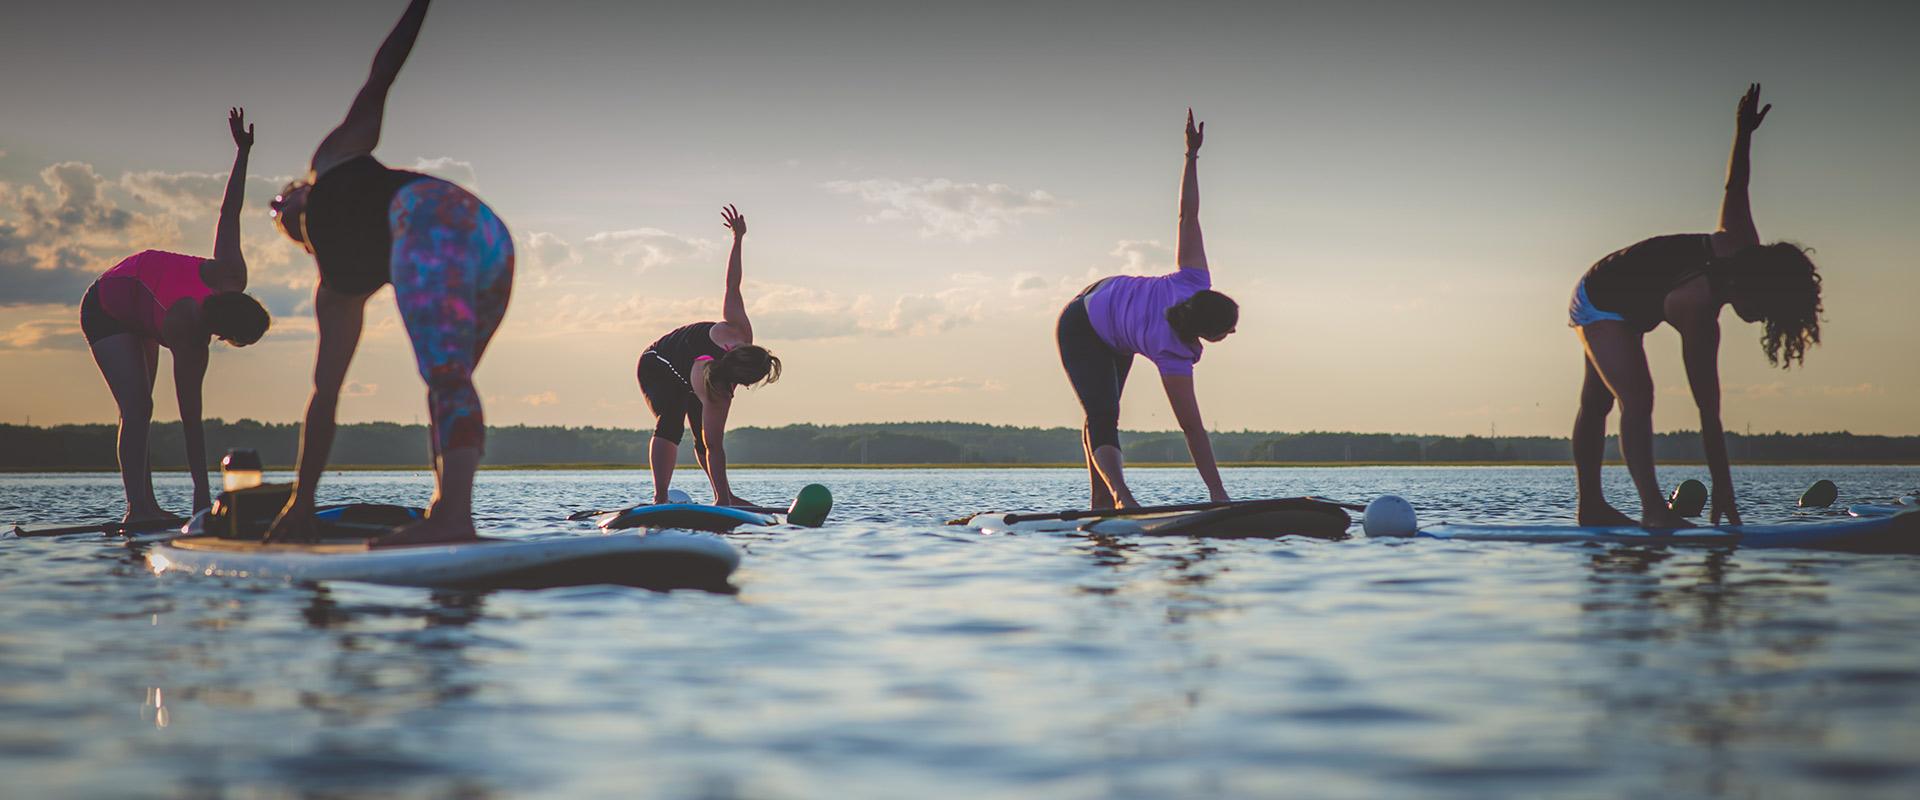 SupYo-Paddleboard-Yoga2